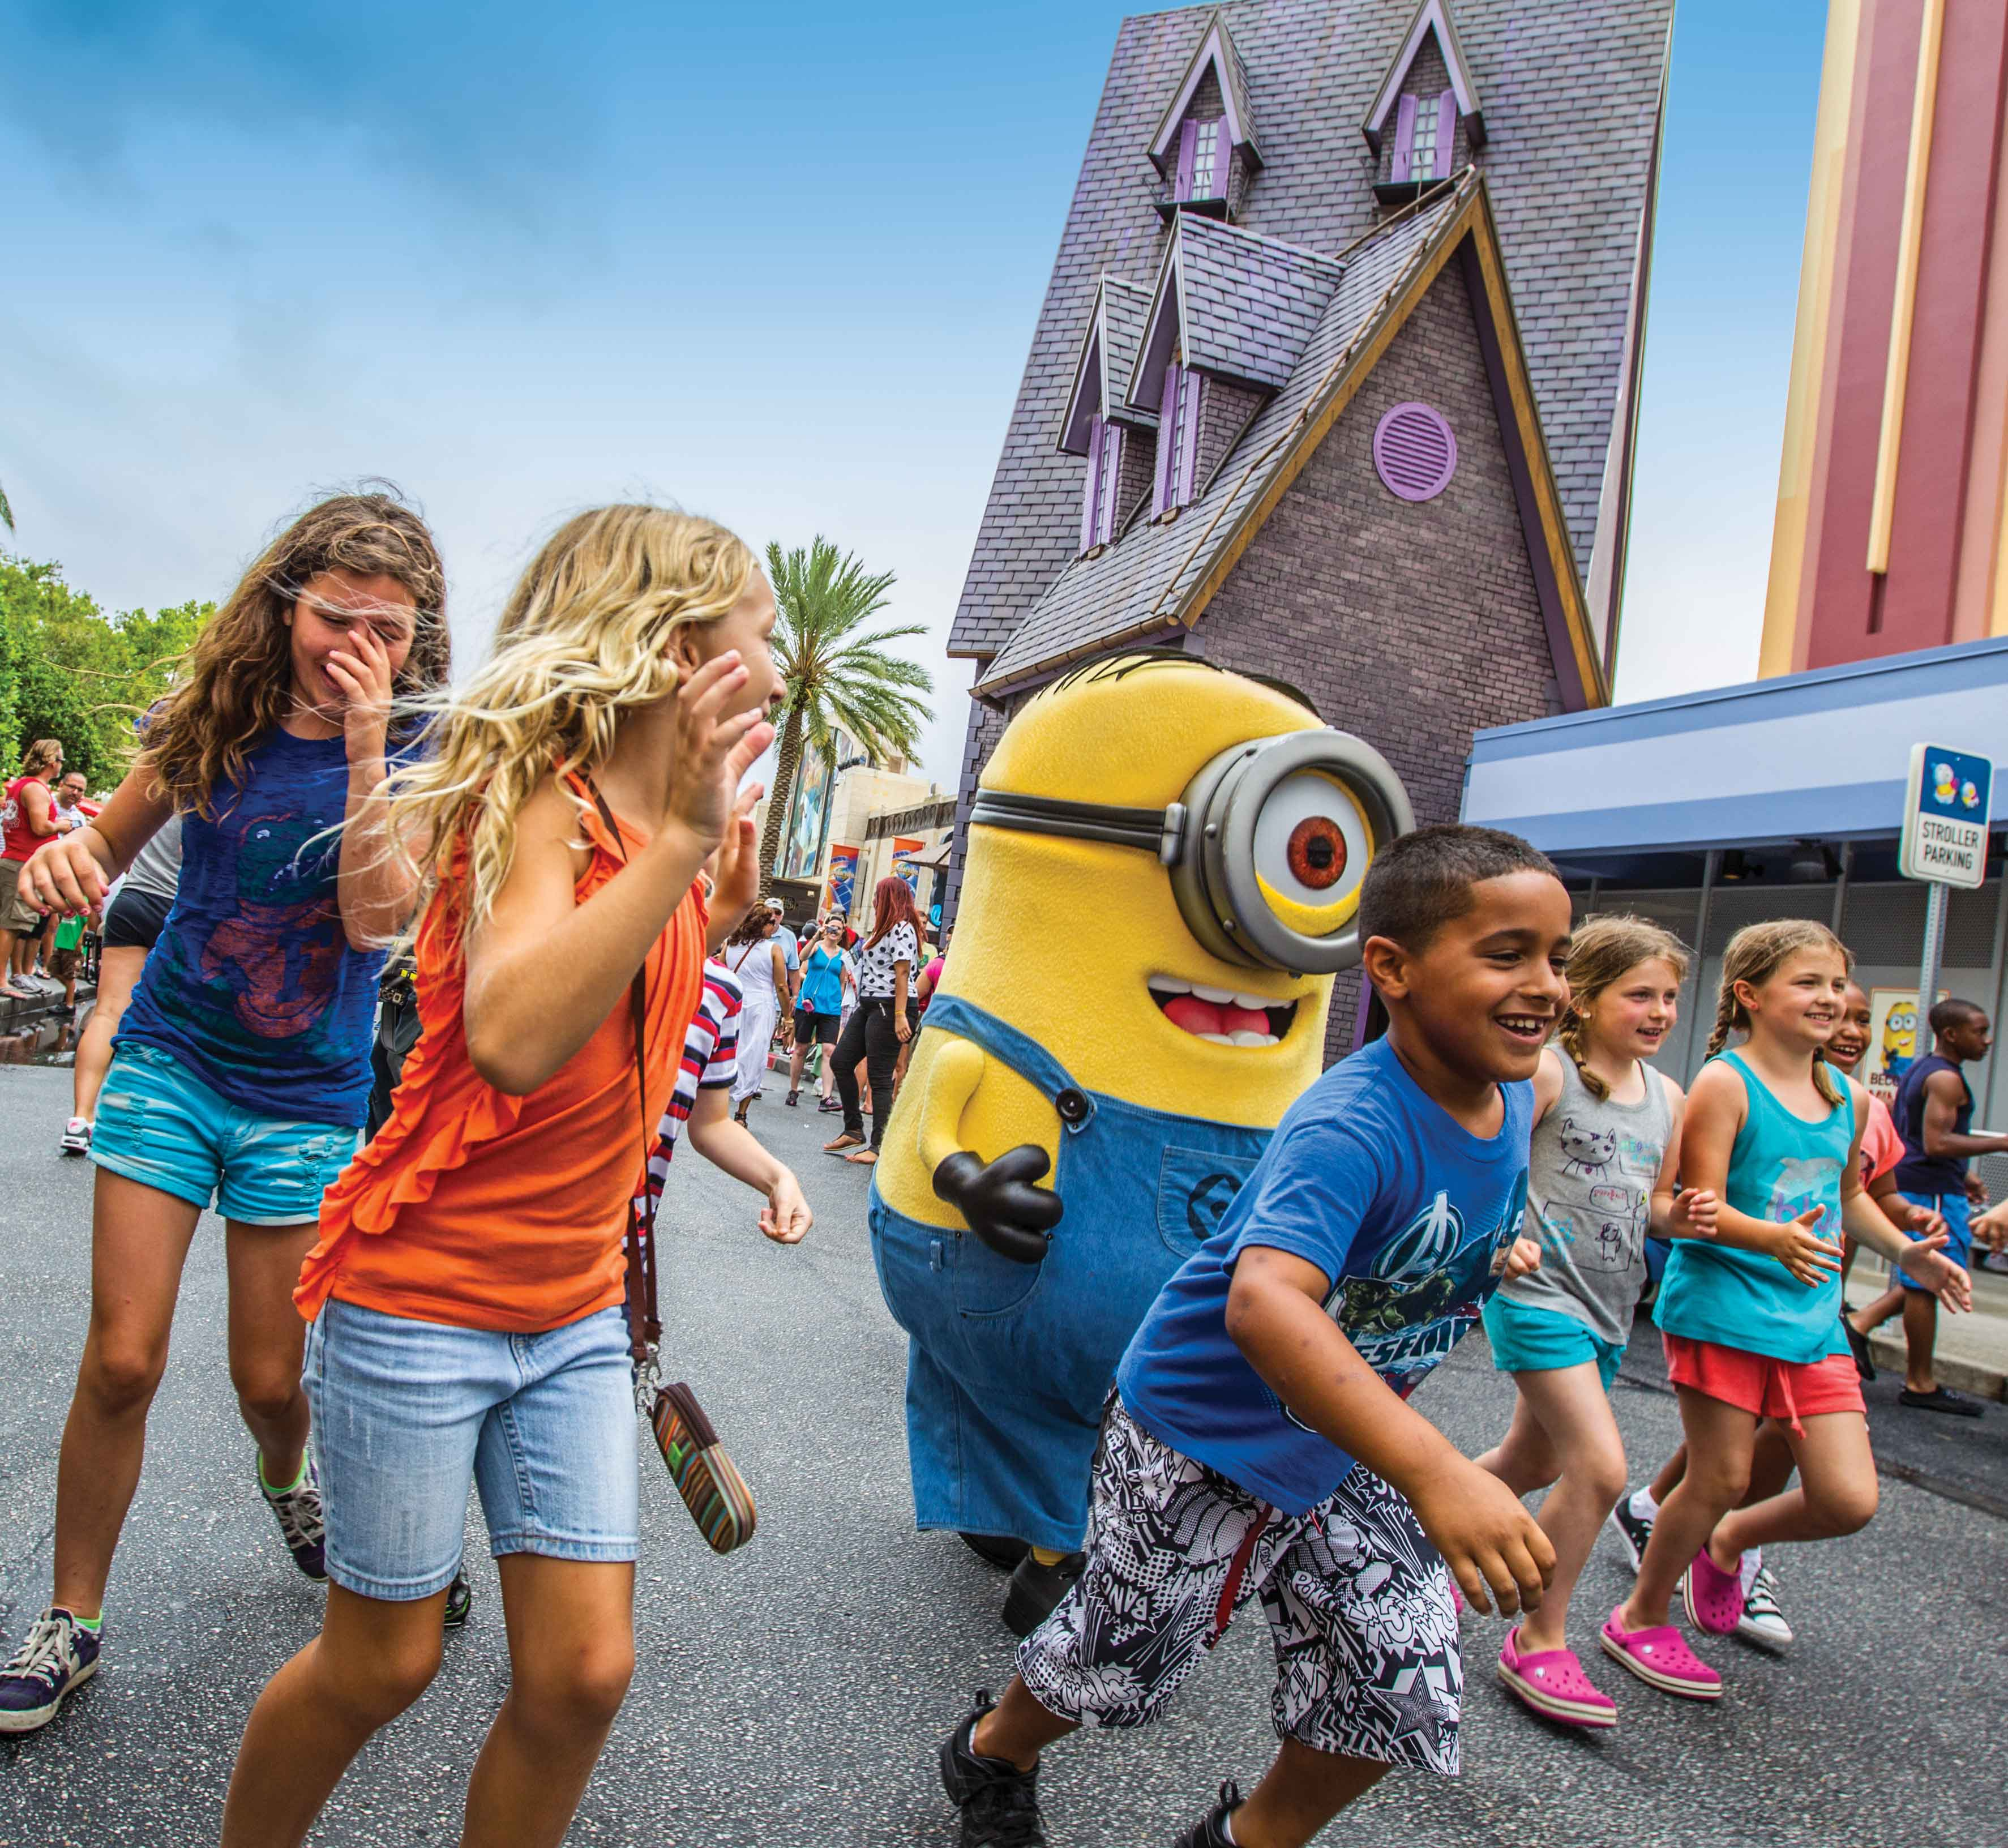 Universal Orlando 3 Park Explorer Ticket From American Holidays